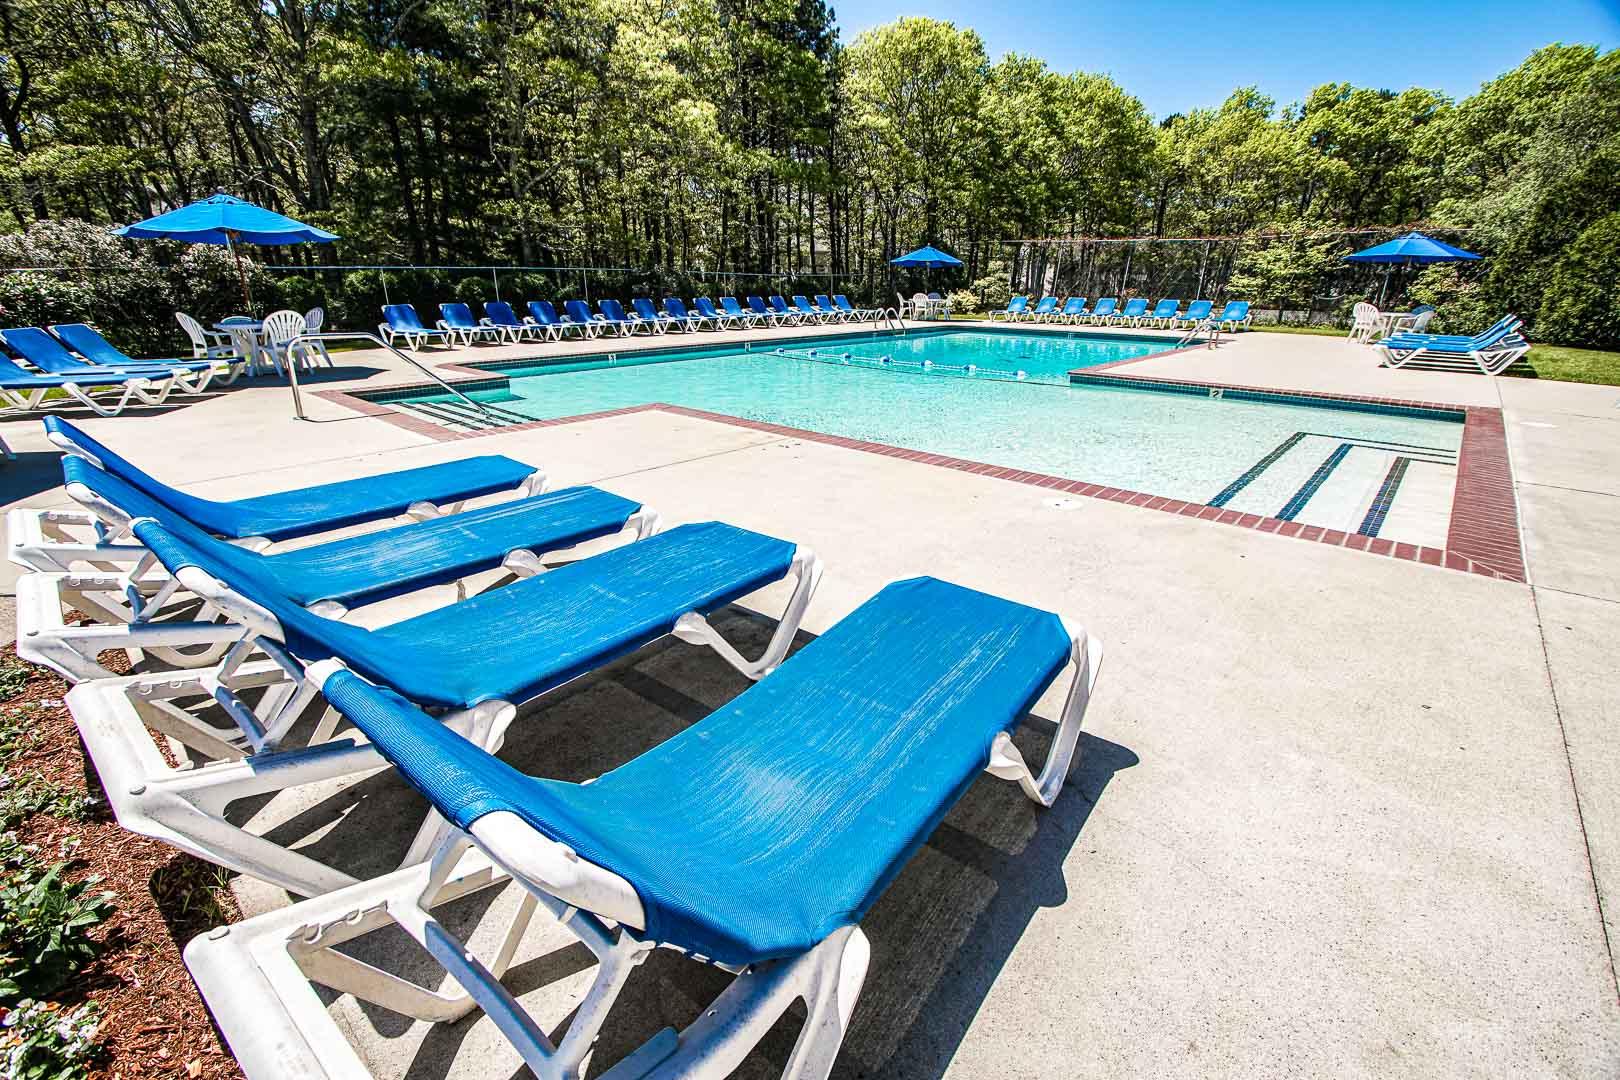 A peaceful outdoor swimming pool at VRI's Sea Mist Resort in Massachusetts.